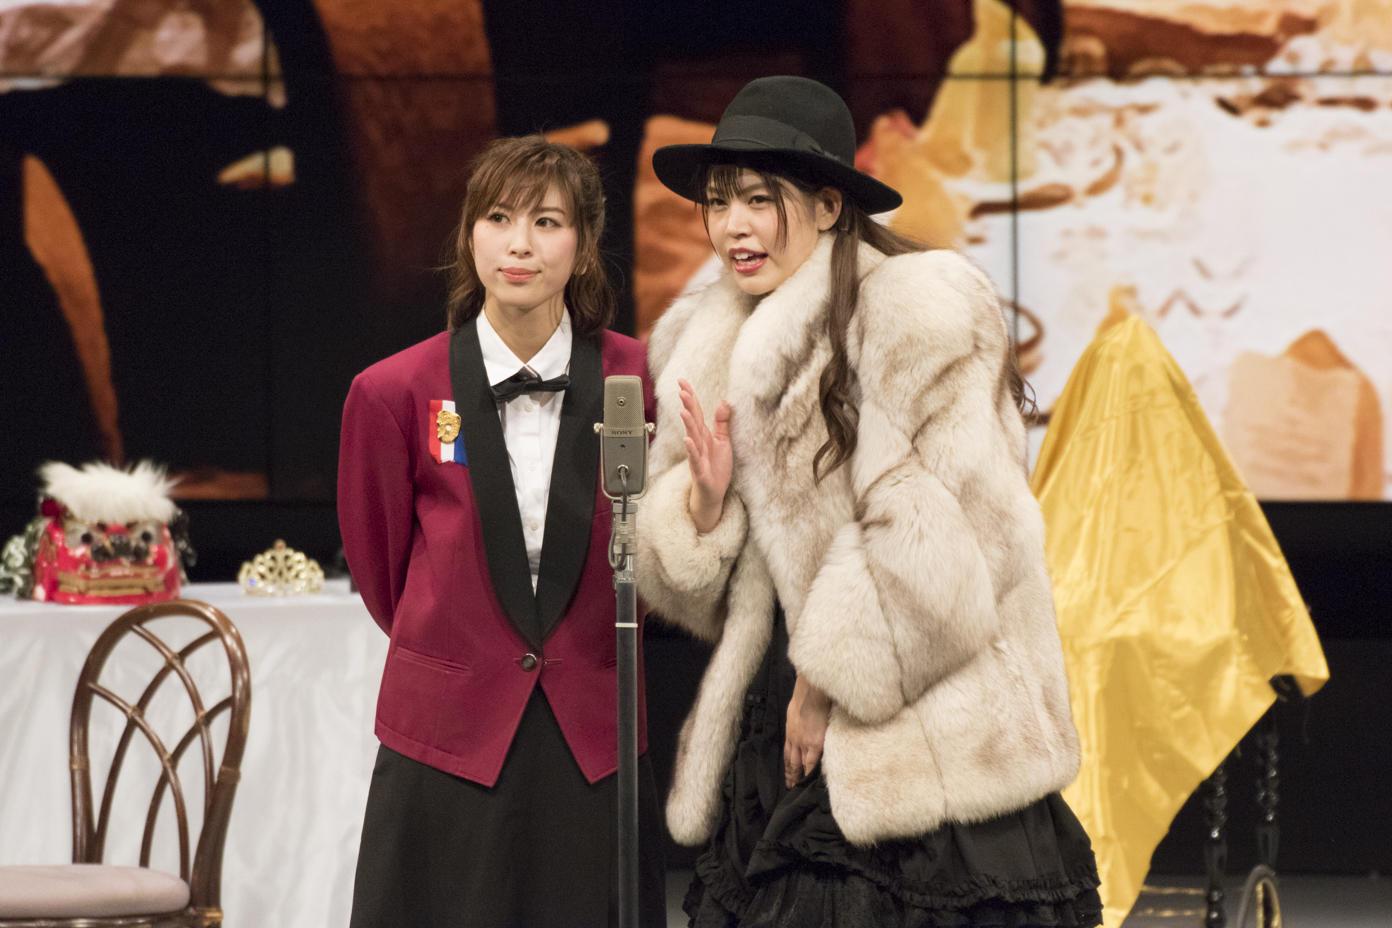 http://news.yoshimoto.co.jp/20161228154729-cad9aac2e7b98352d890a9a4b5cdb4c49187a85e.jpg